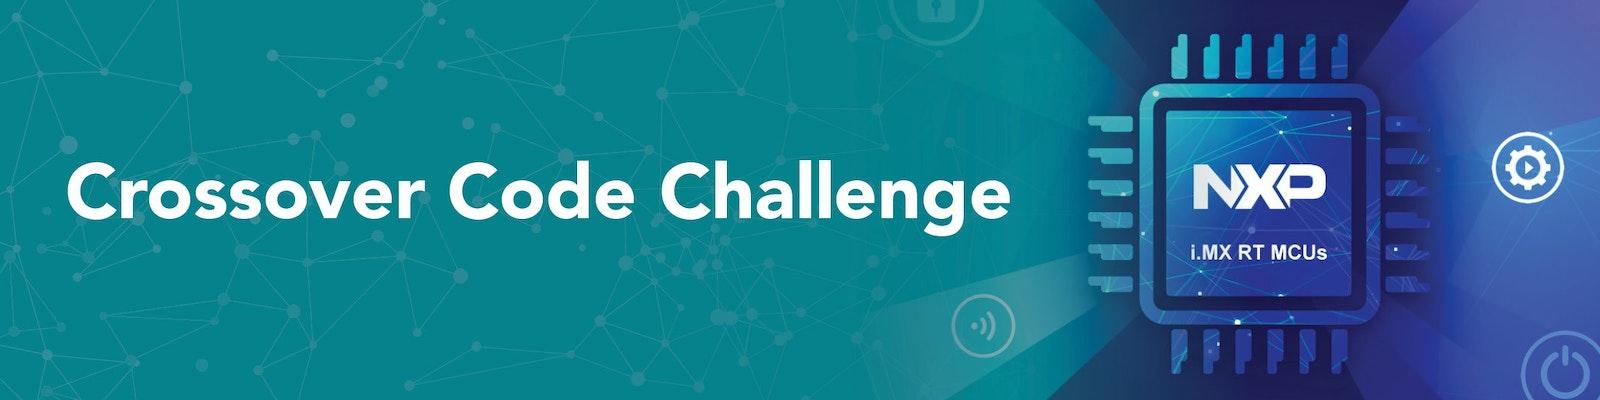 Crossover Code Challenge